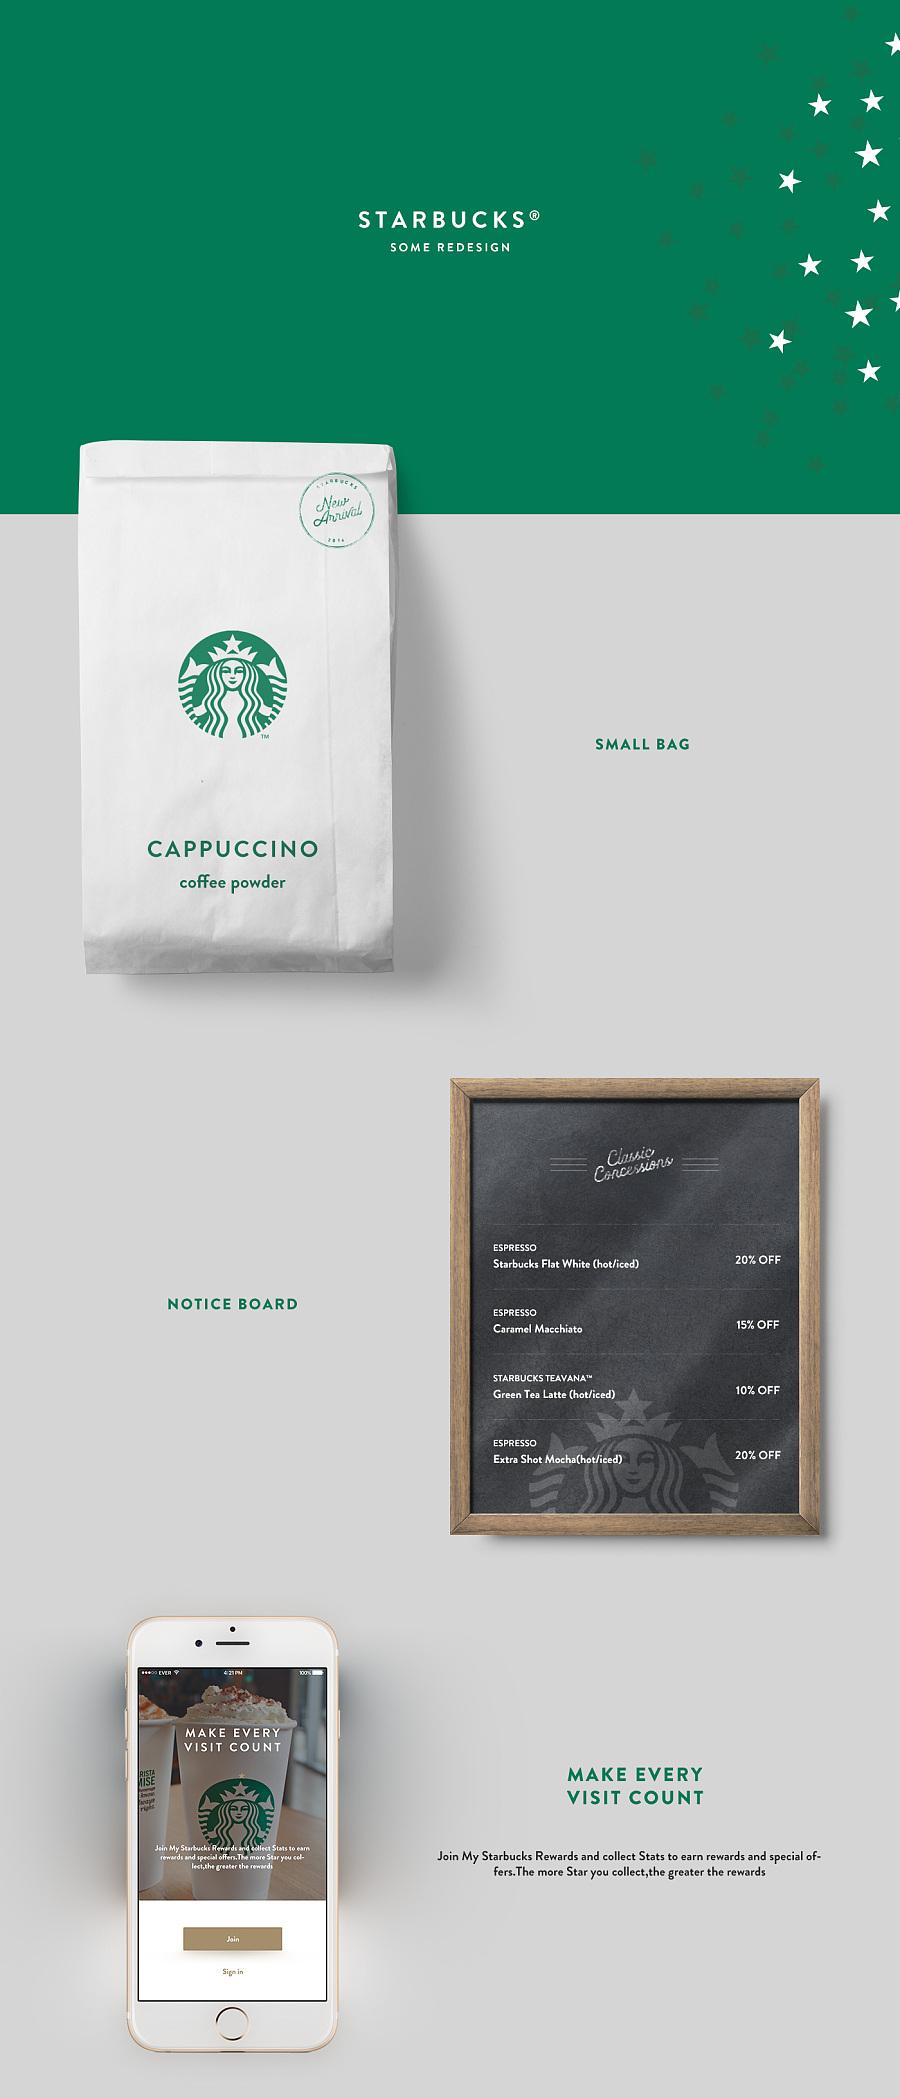 查看《Starbucks some redesign》原图,原图尺寸:1400x3264